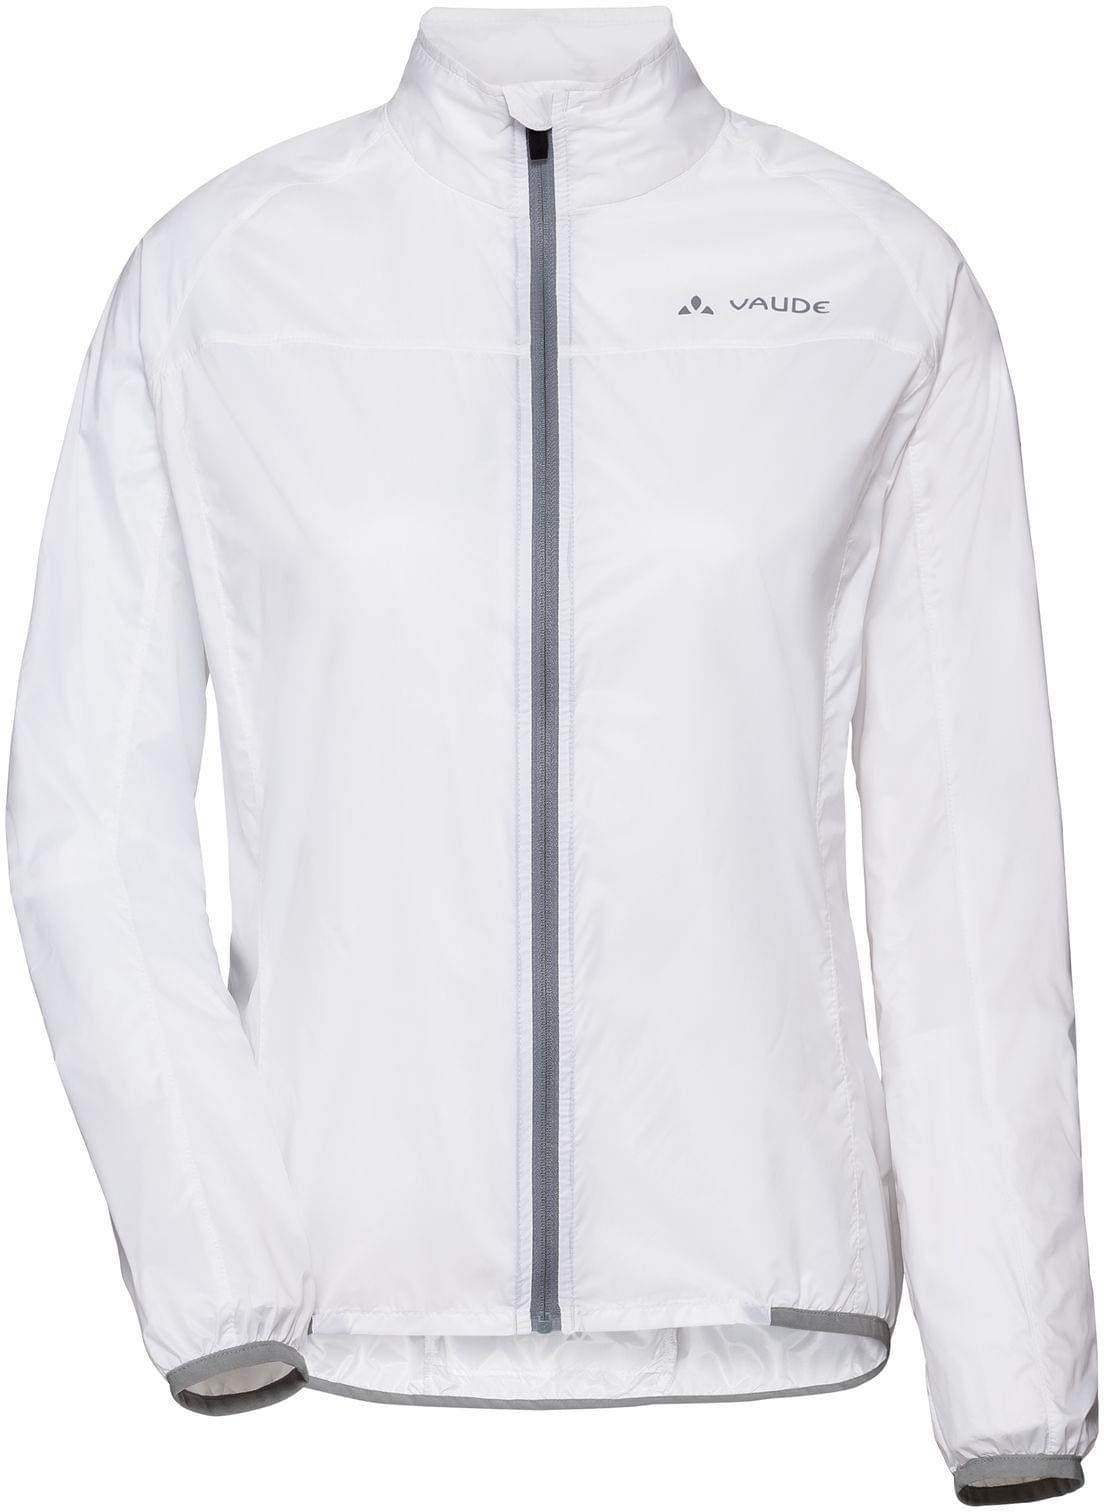 Vaude Women's Air Jacket III - white 36